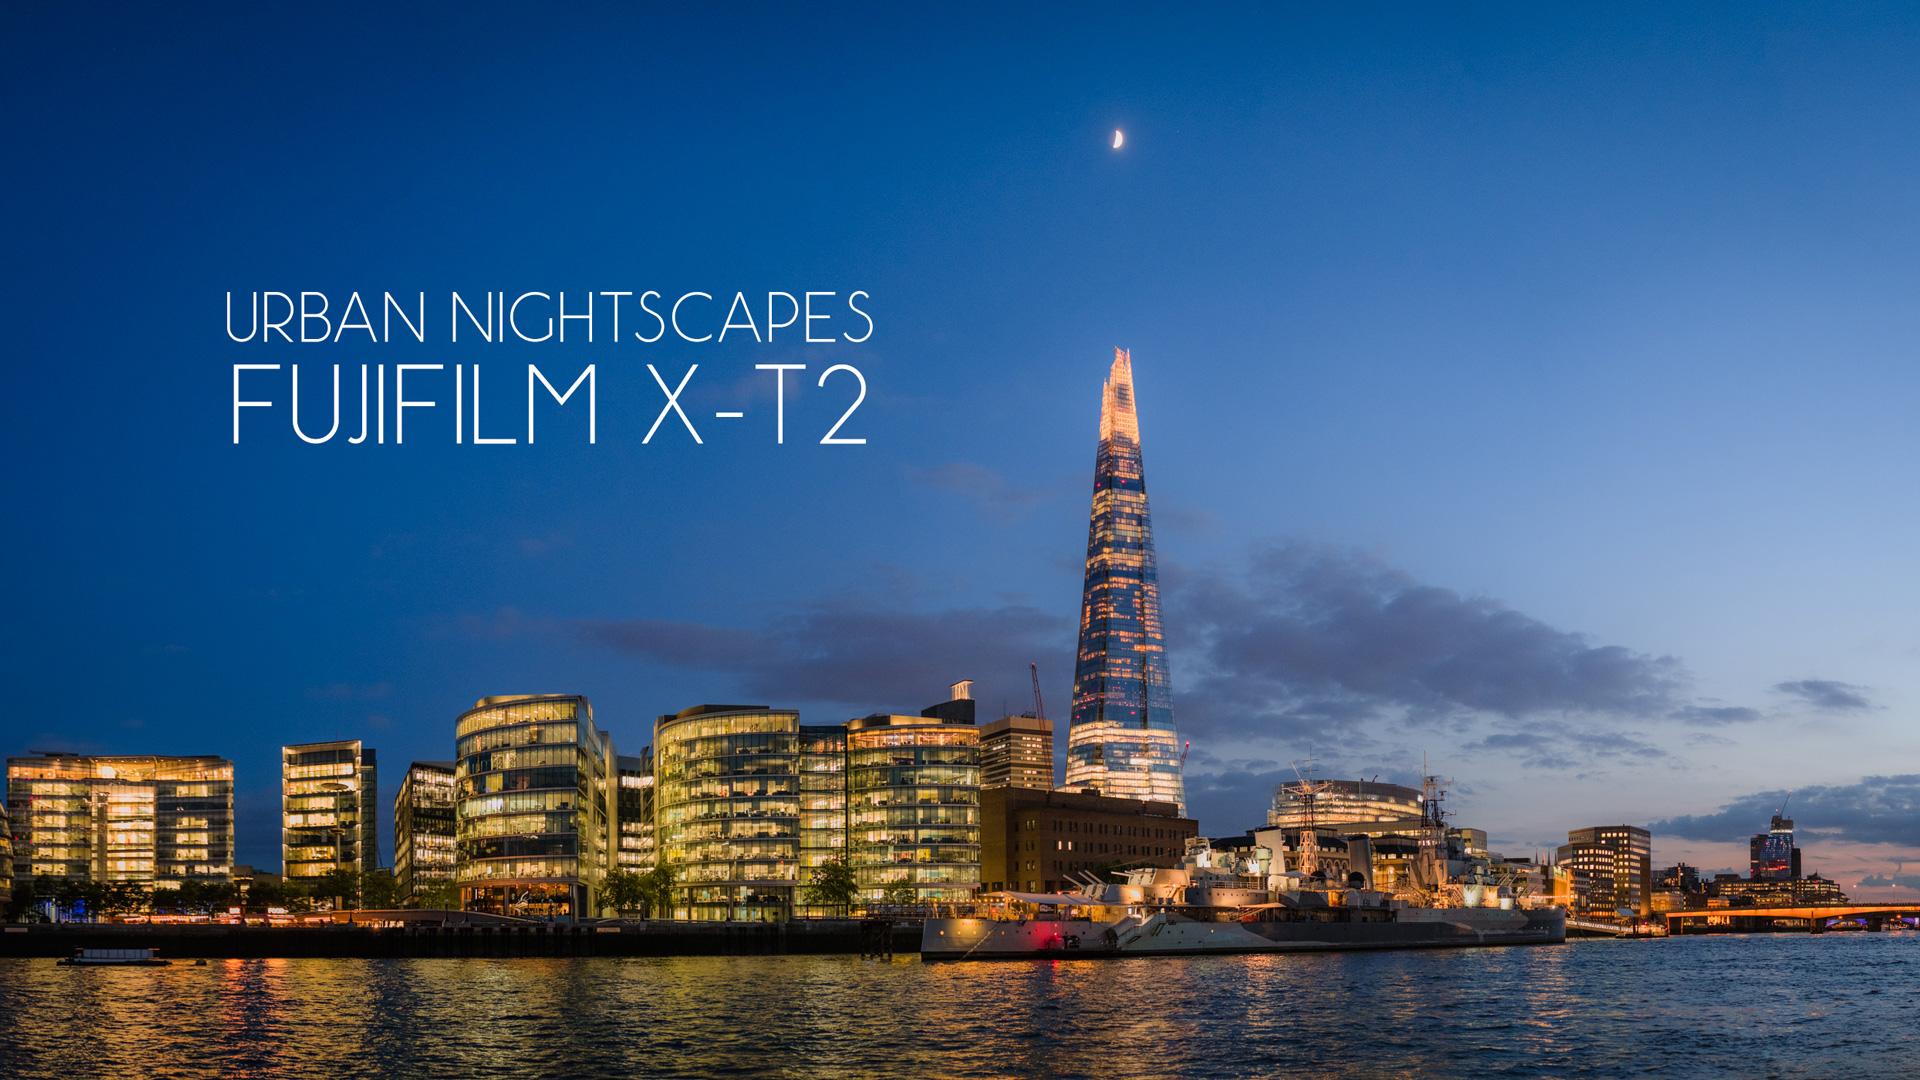 Fujifilm X-T2 Review: Urban Nightscapes